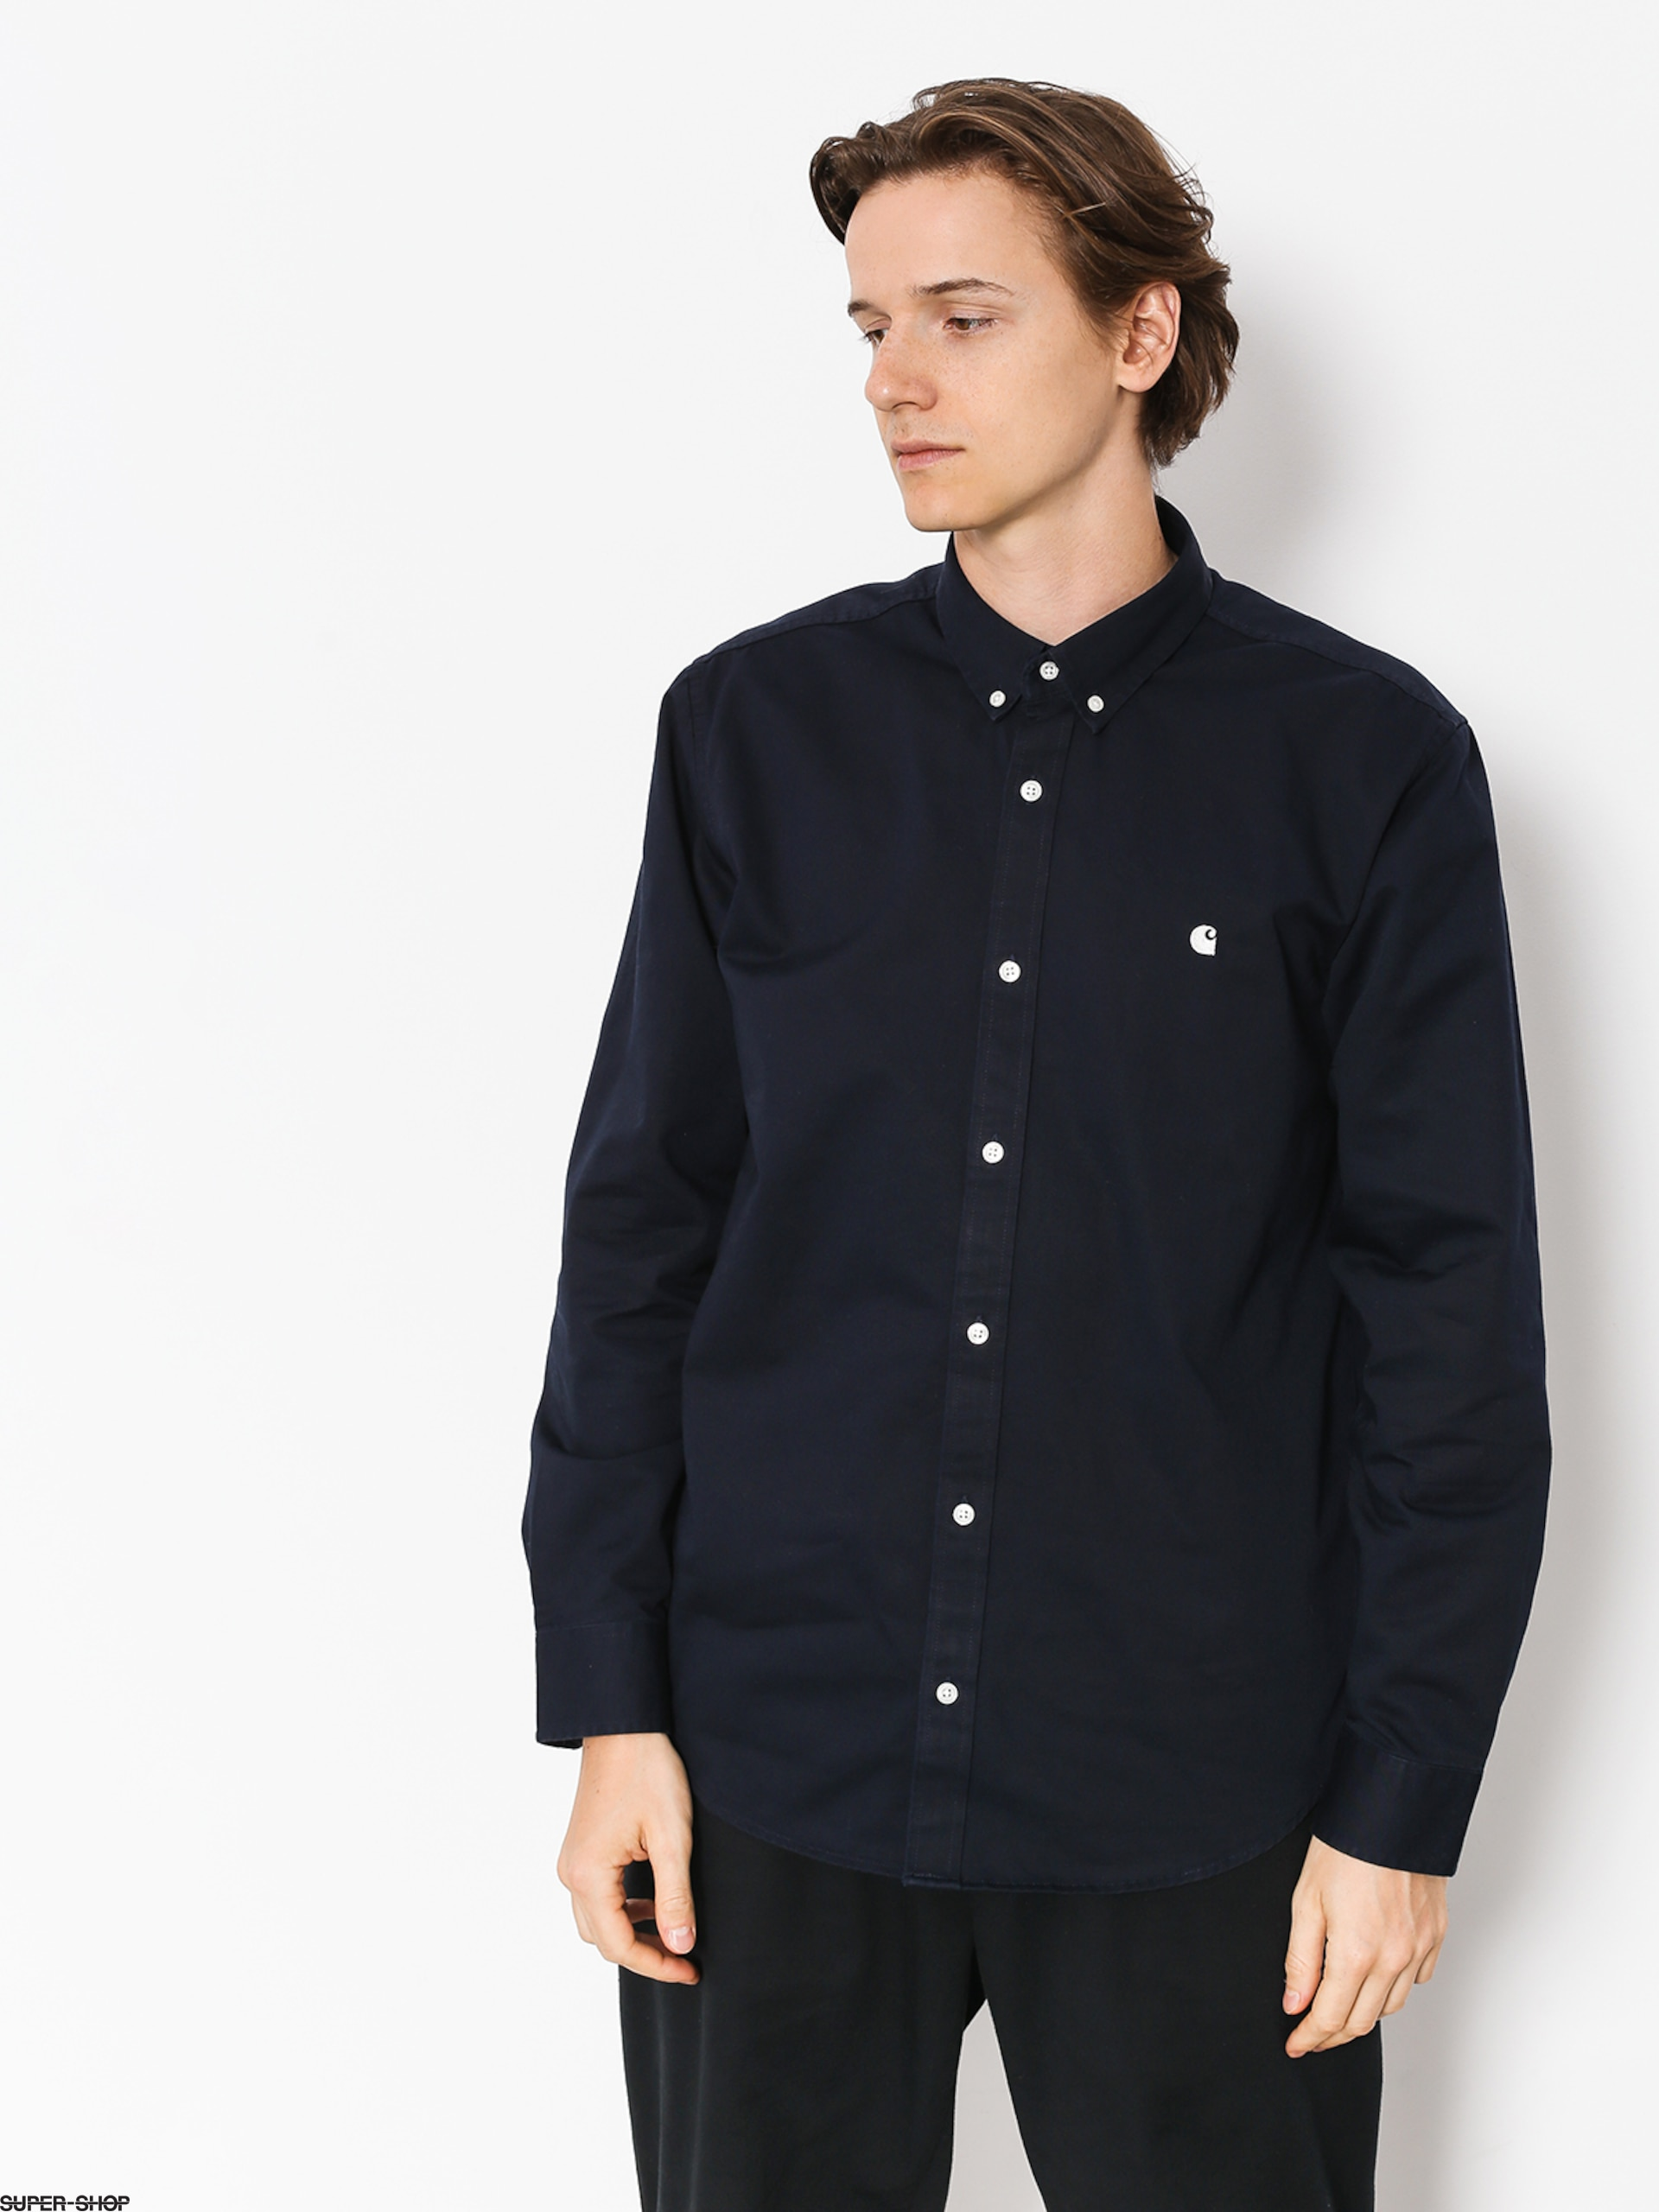 90946db997e2 971962-w1920-carhartt-wip-shirt-madison-ls-dark-navy-wax.jpg